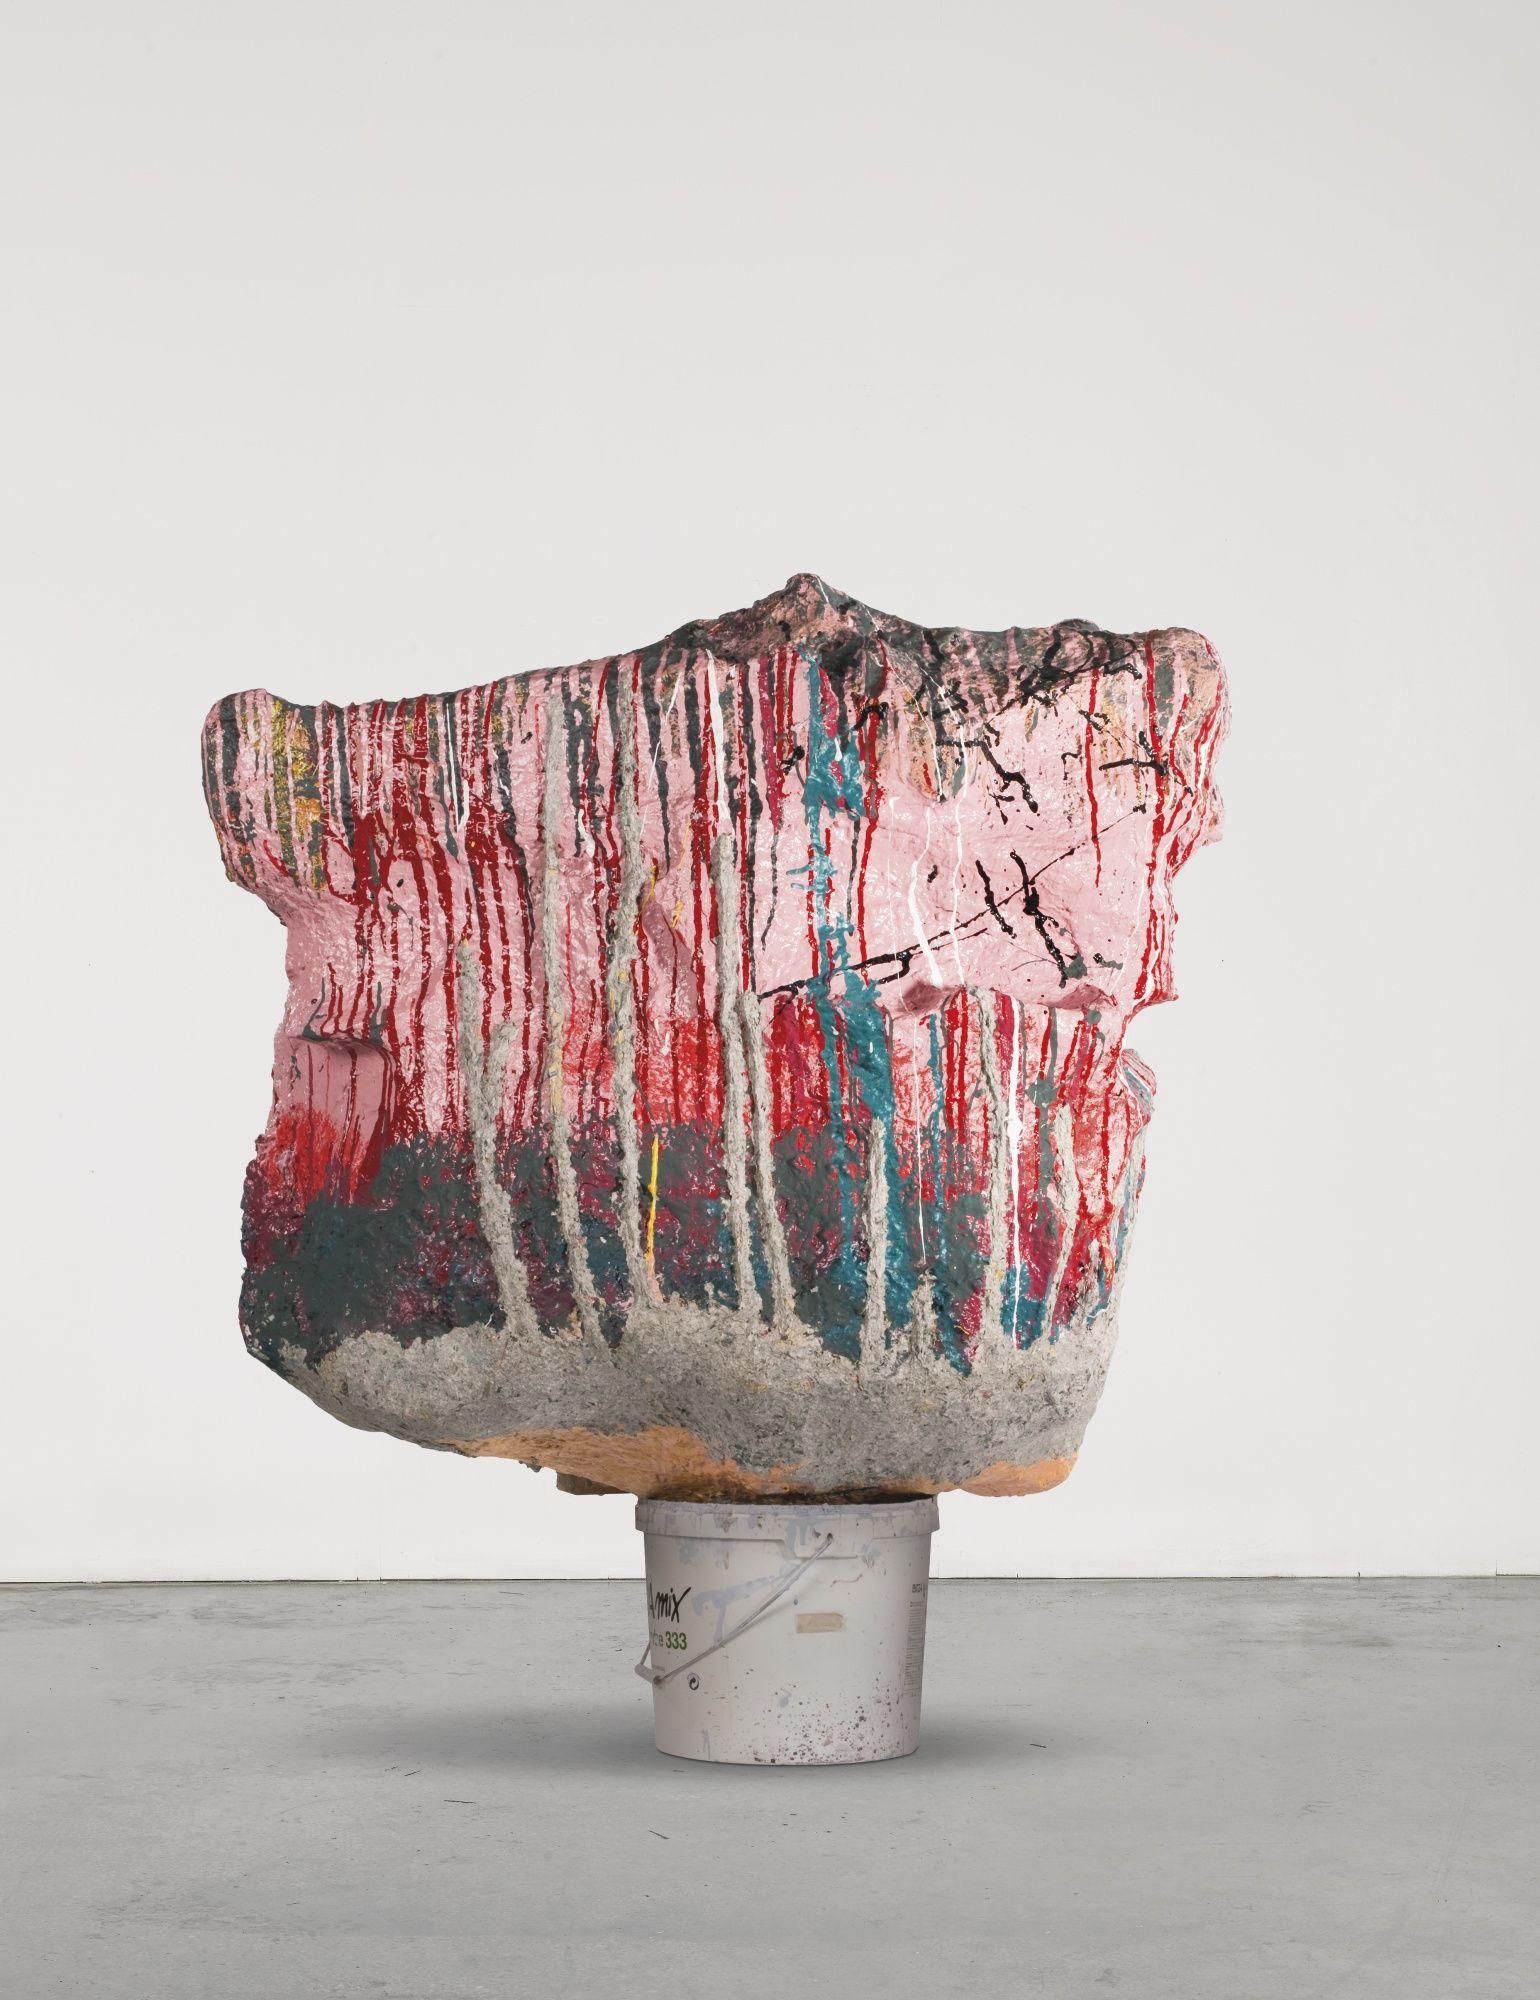 Franz West | lot | Sotheby's